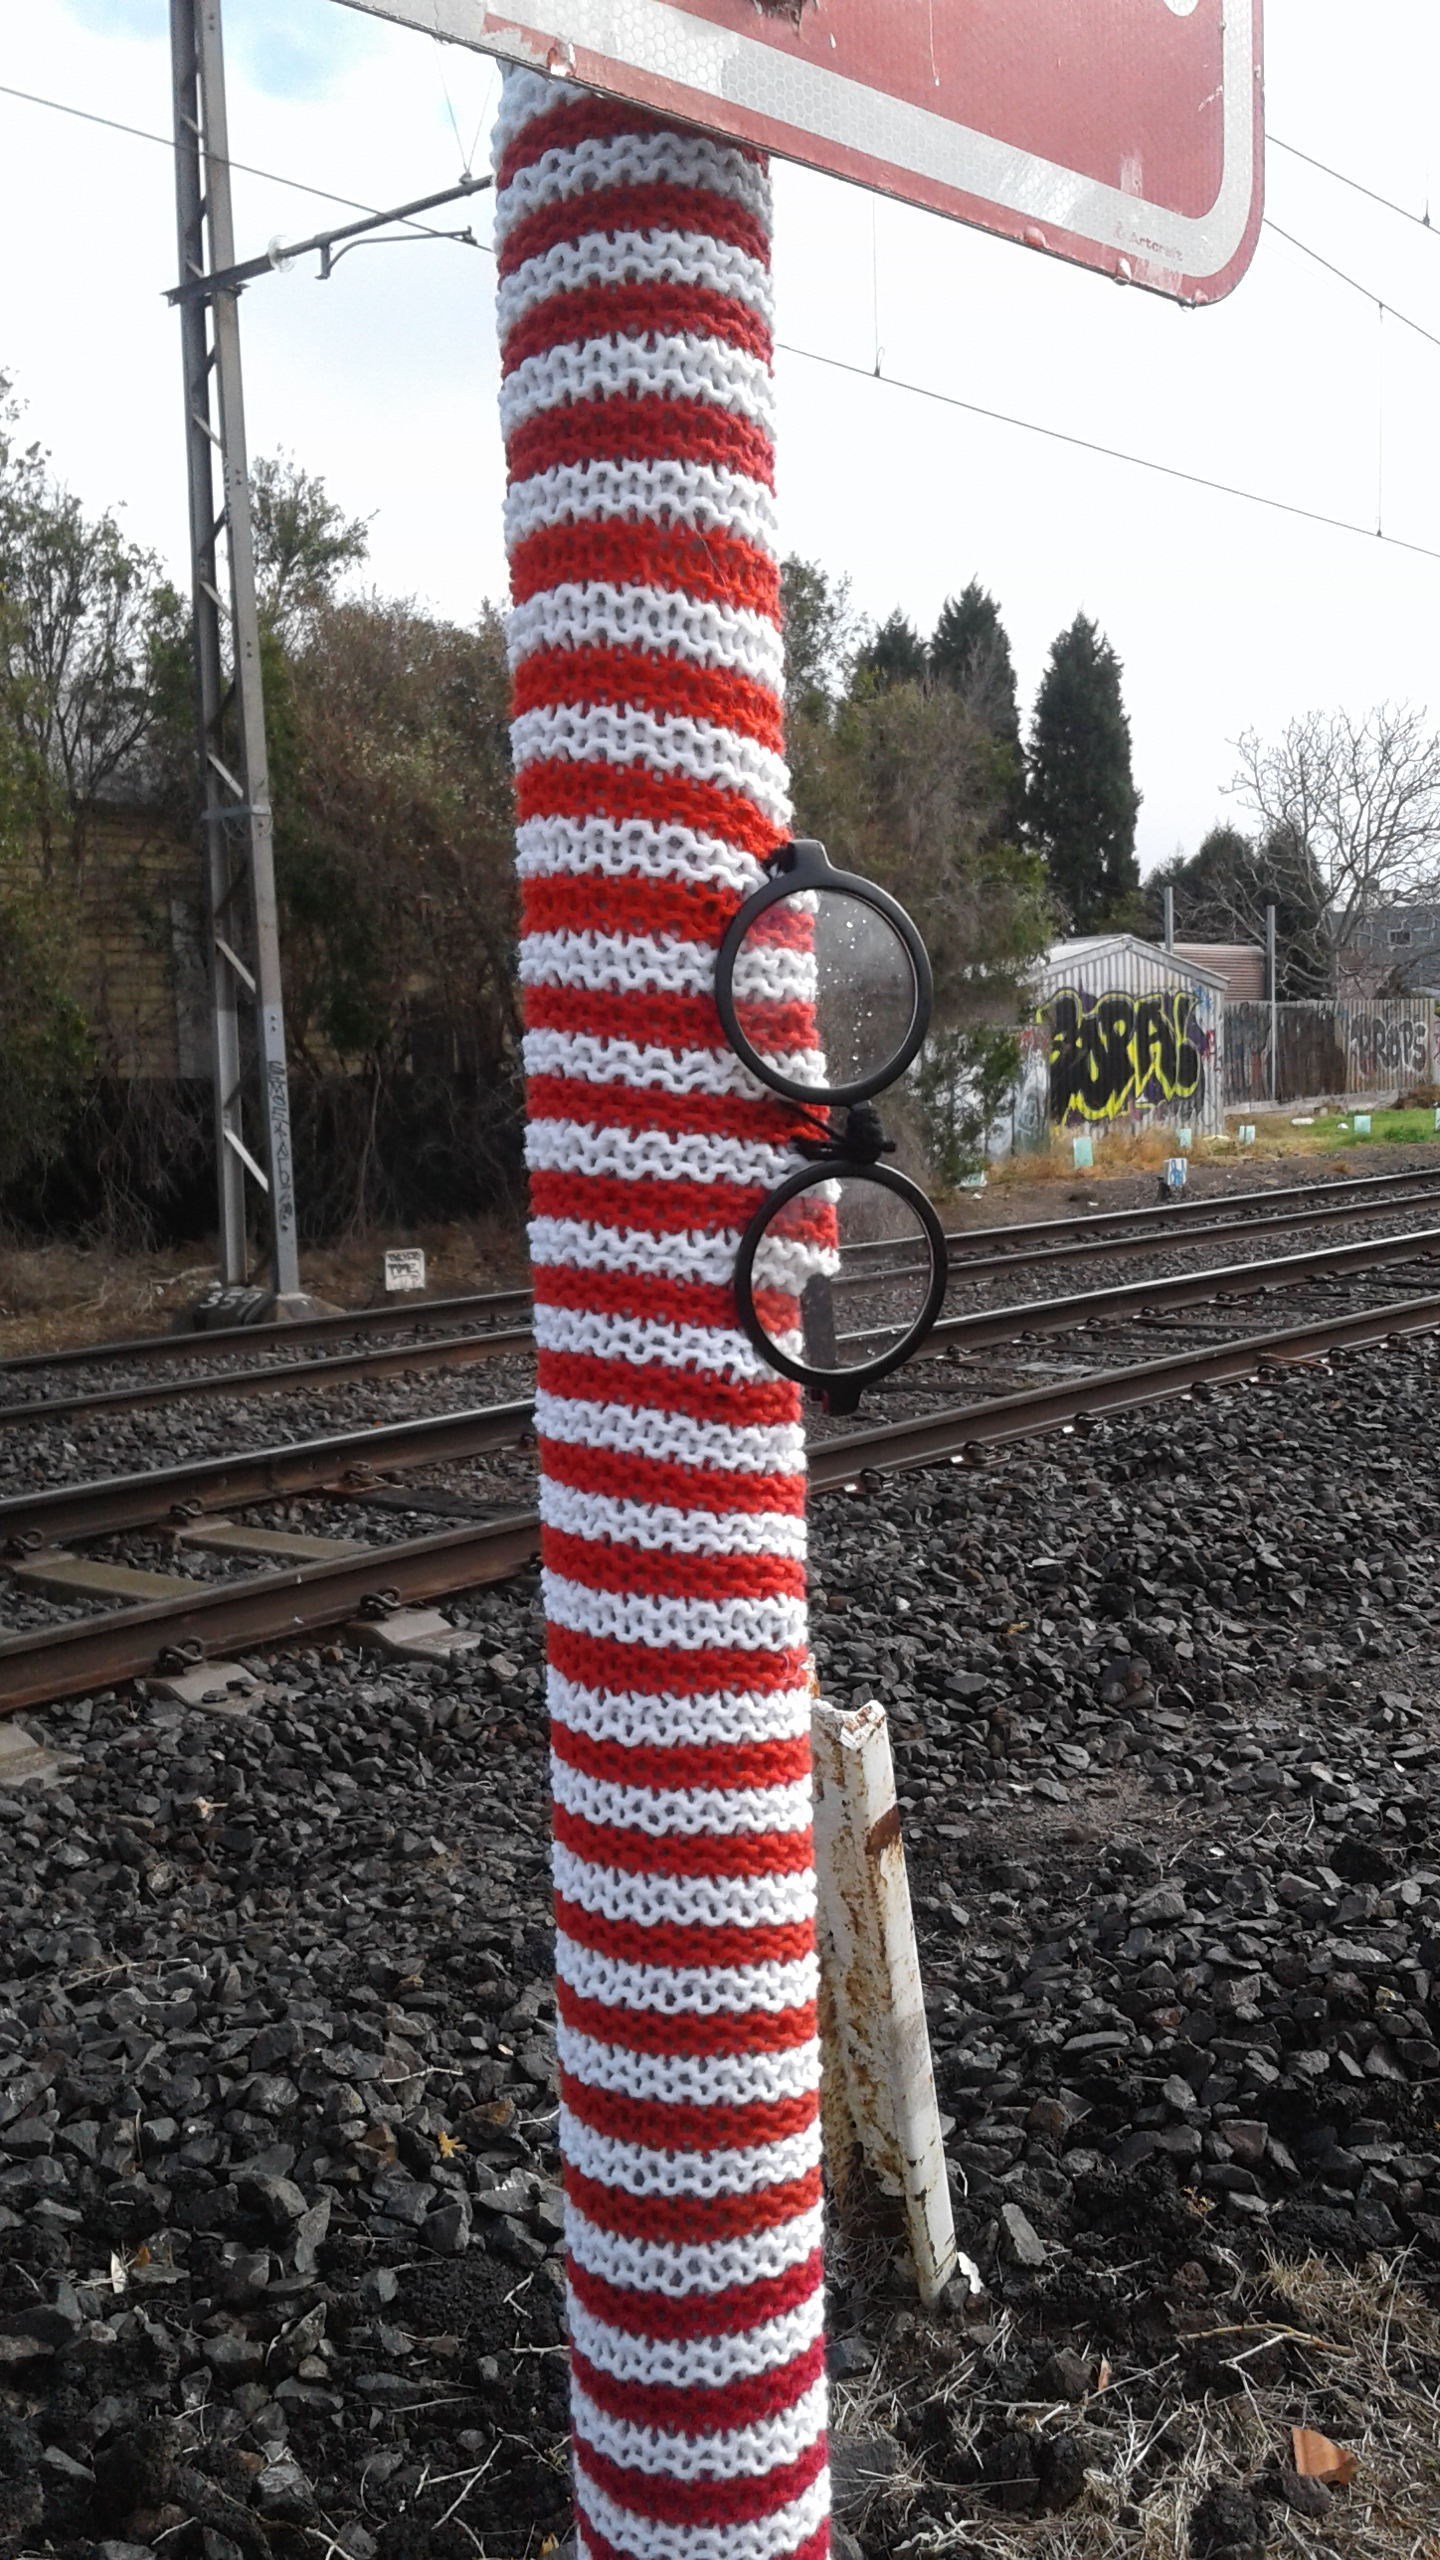 Yarn corner